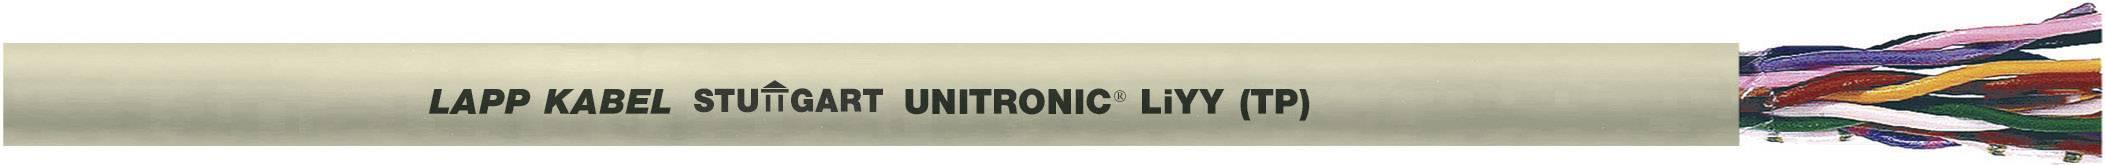 Datový kabel UNITRONIC LIYY TP 3x2x0,14